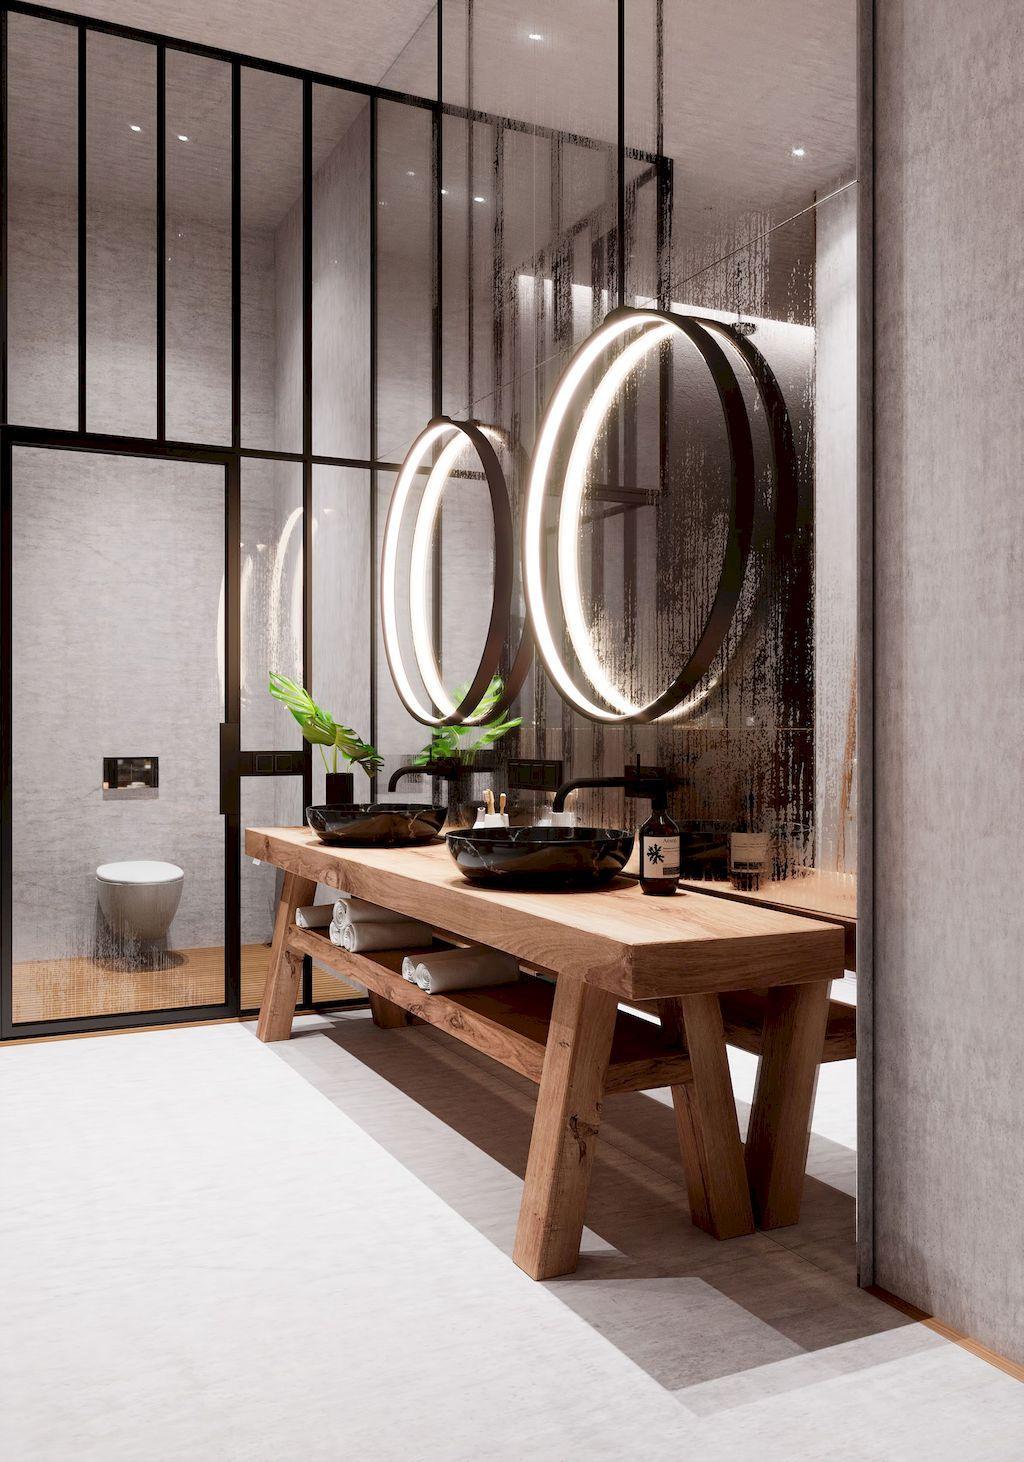 Lavabo A Colonna Design beautiful scandinavian interiors for your home | salle de